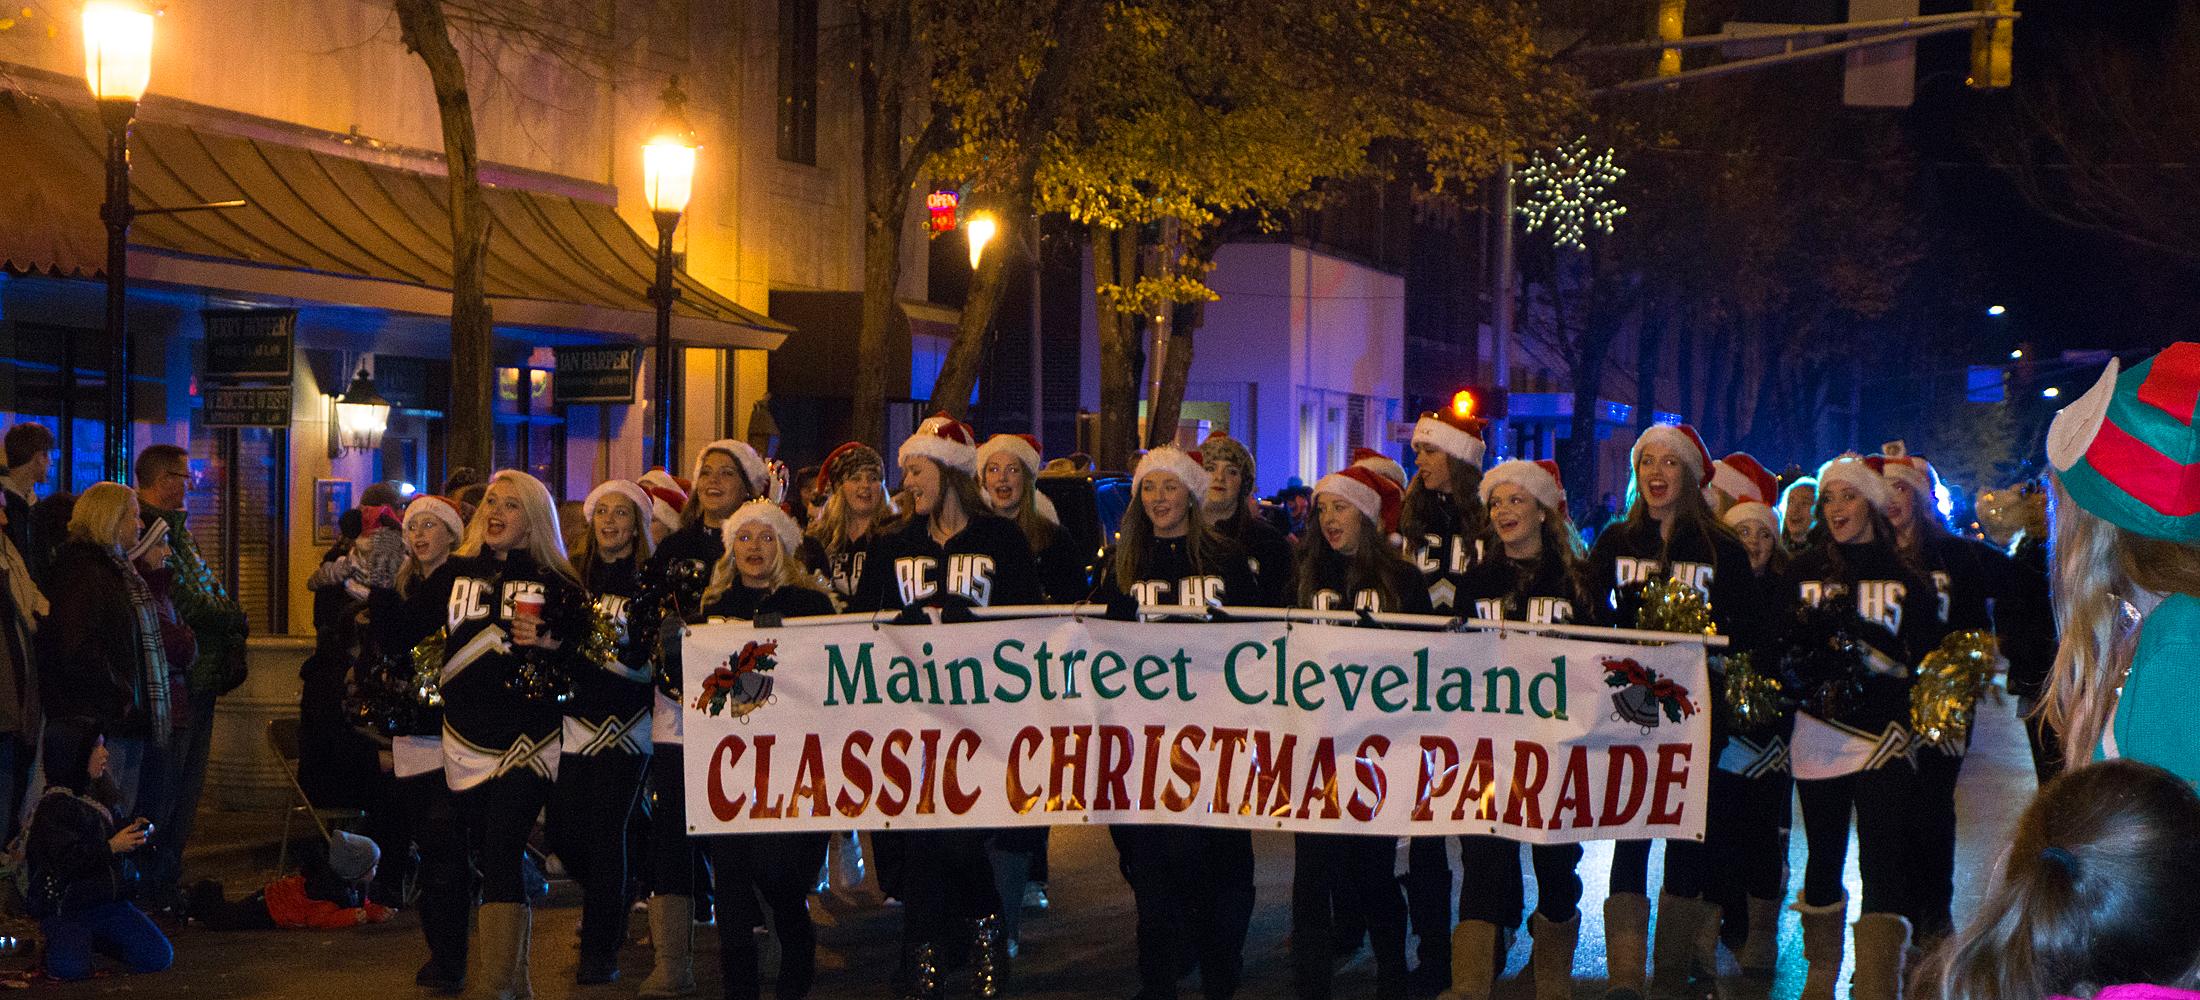 Cleveland Tn Christmas Parade 2020 Christmas parade   Visit Cleveland TN